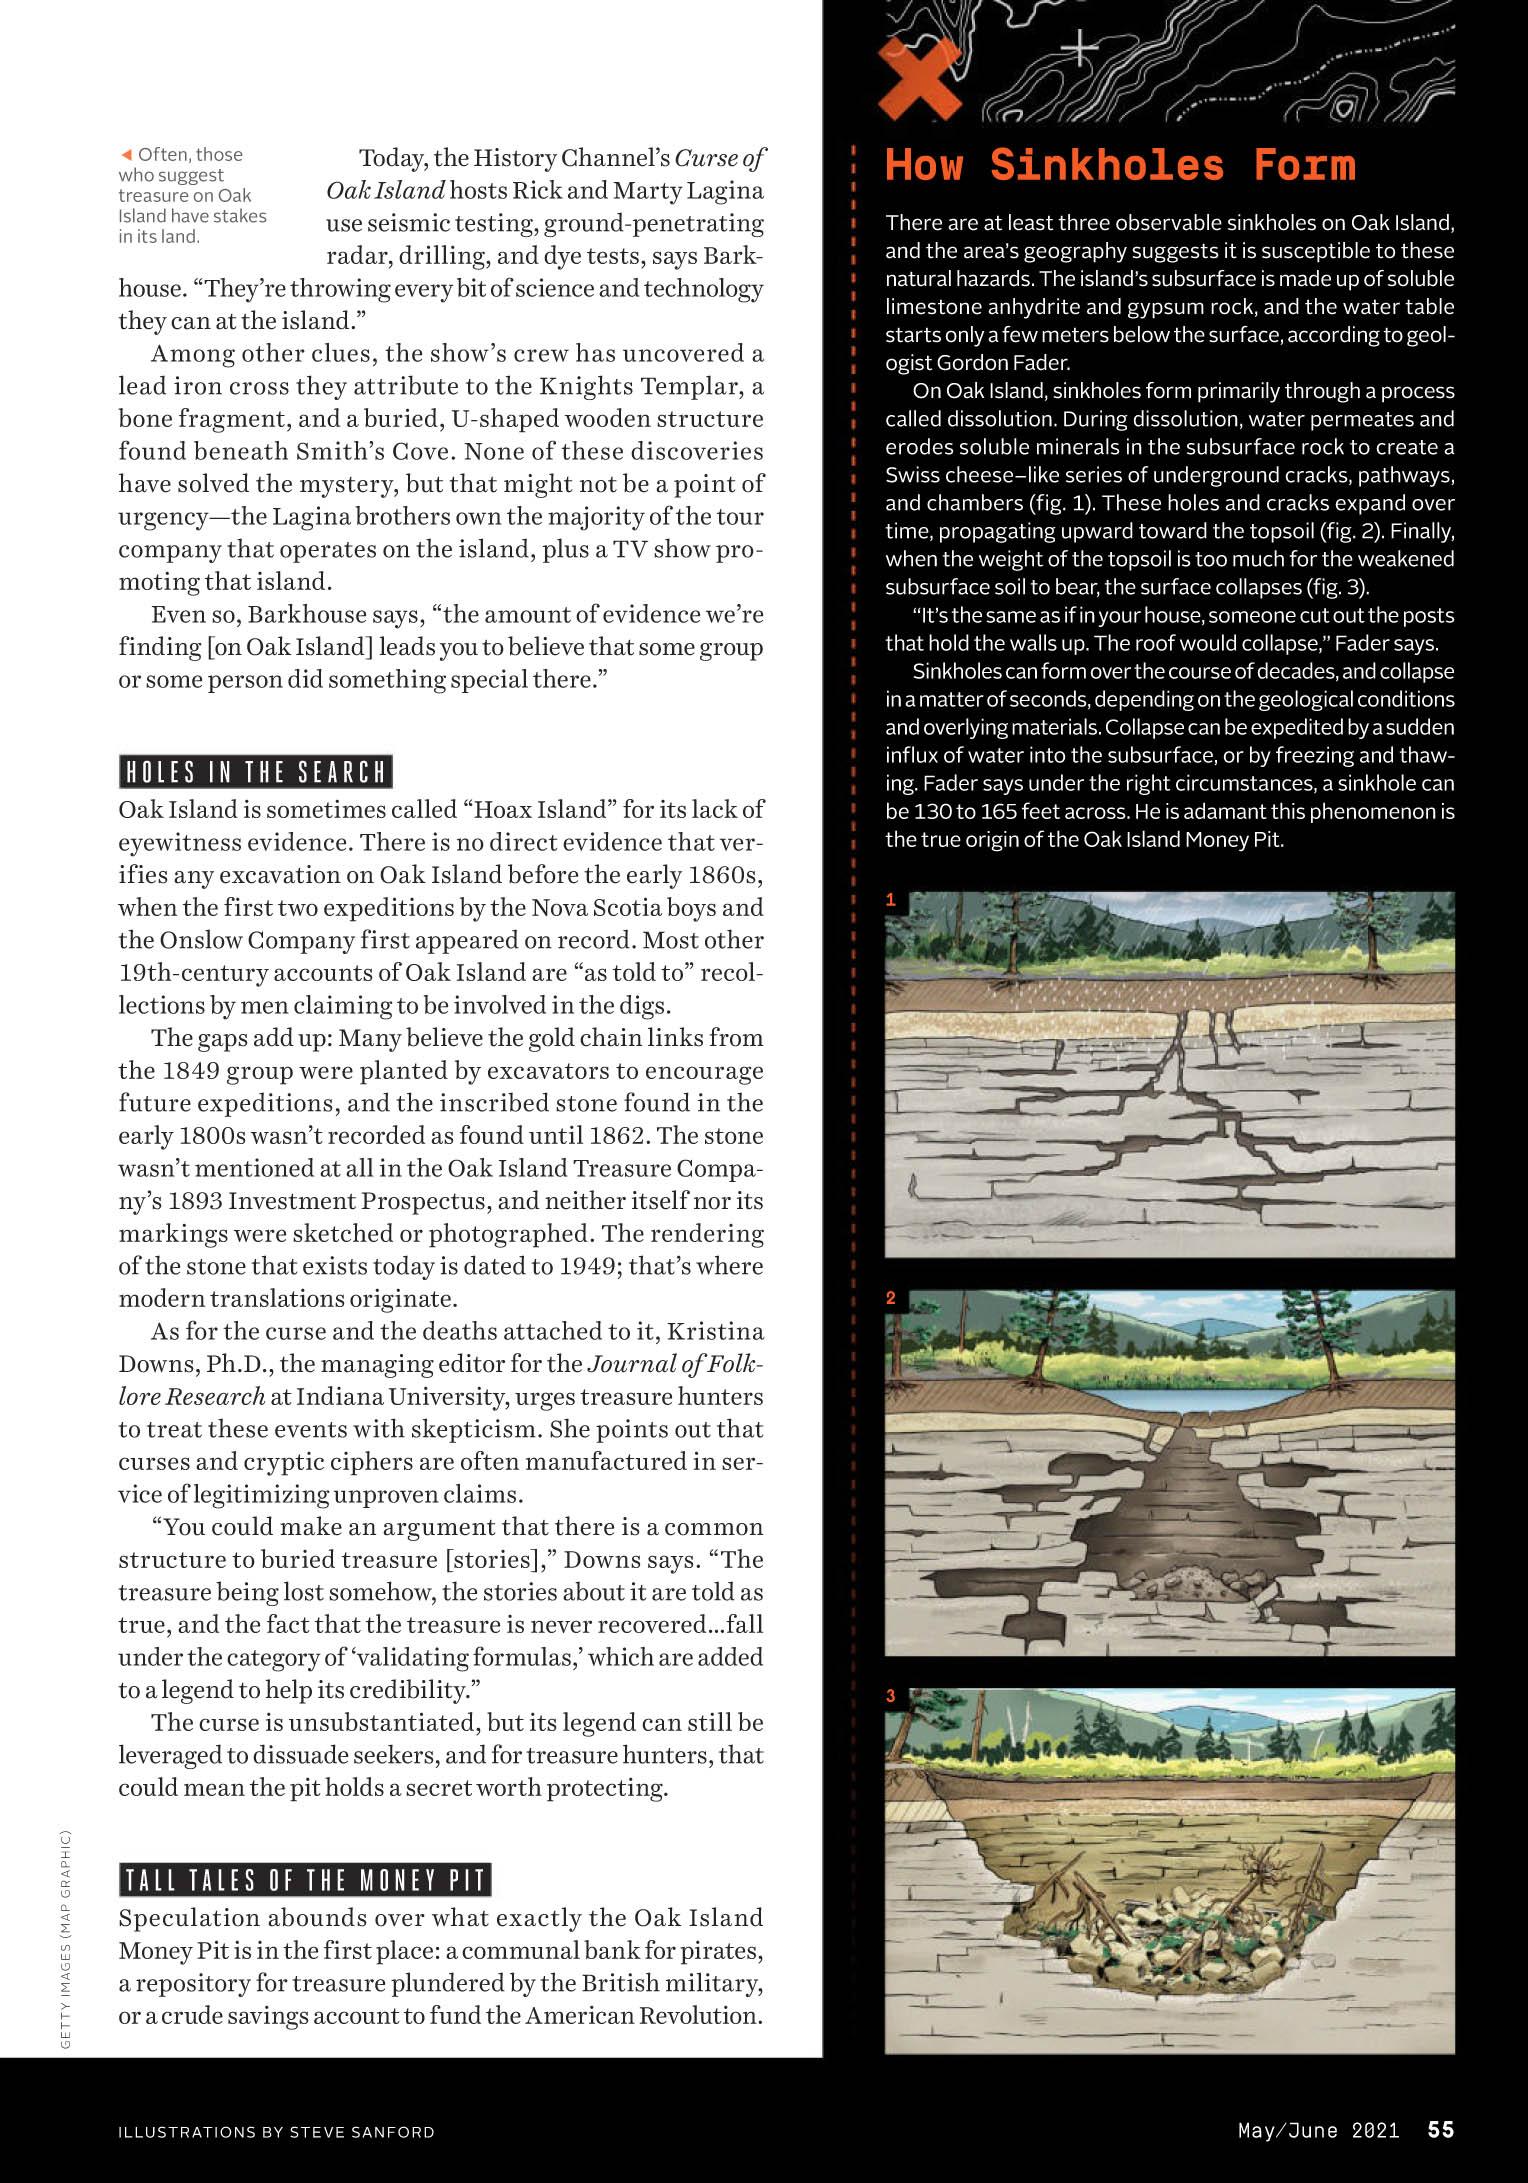 Popular Mechanics 2021-05-06 Oak Island 05.jpg